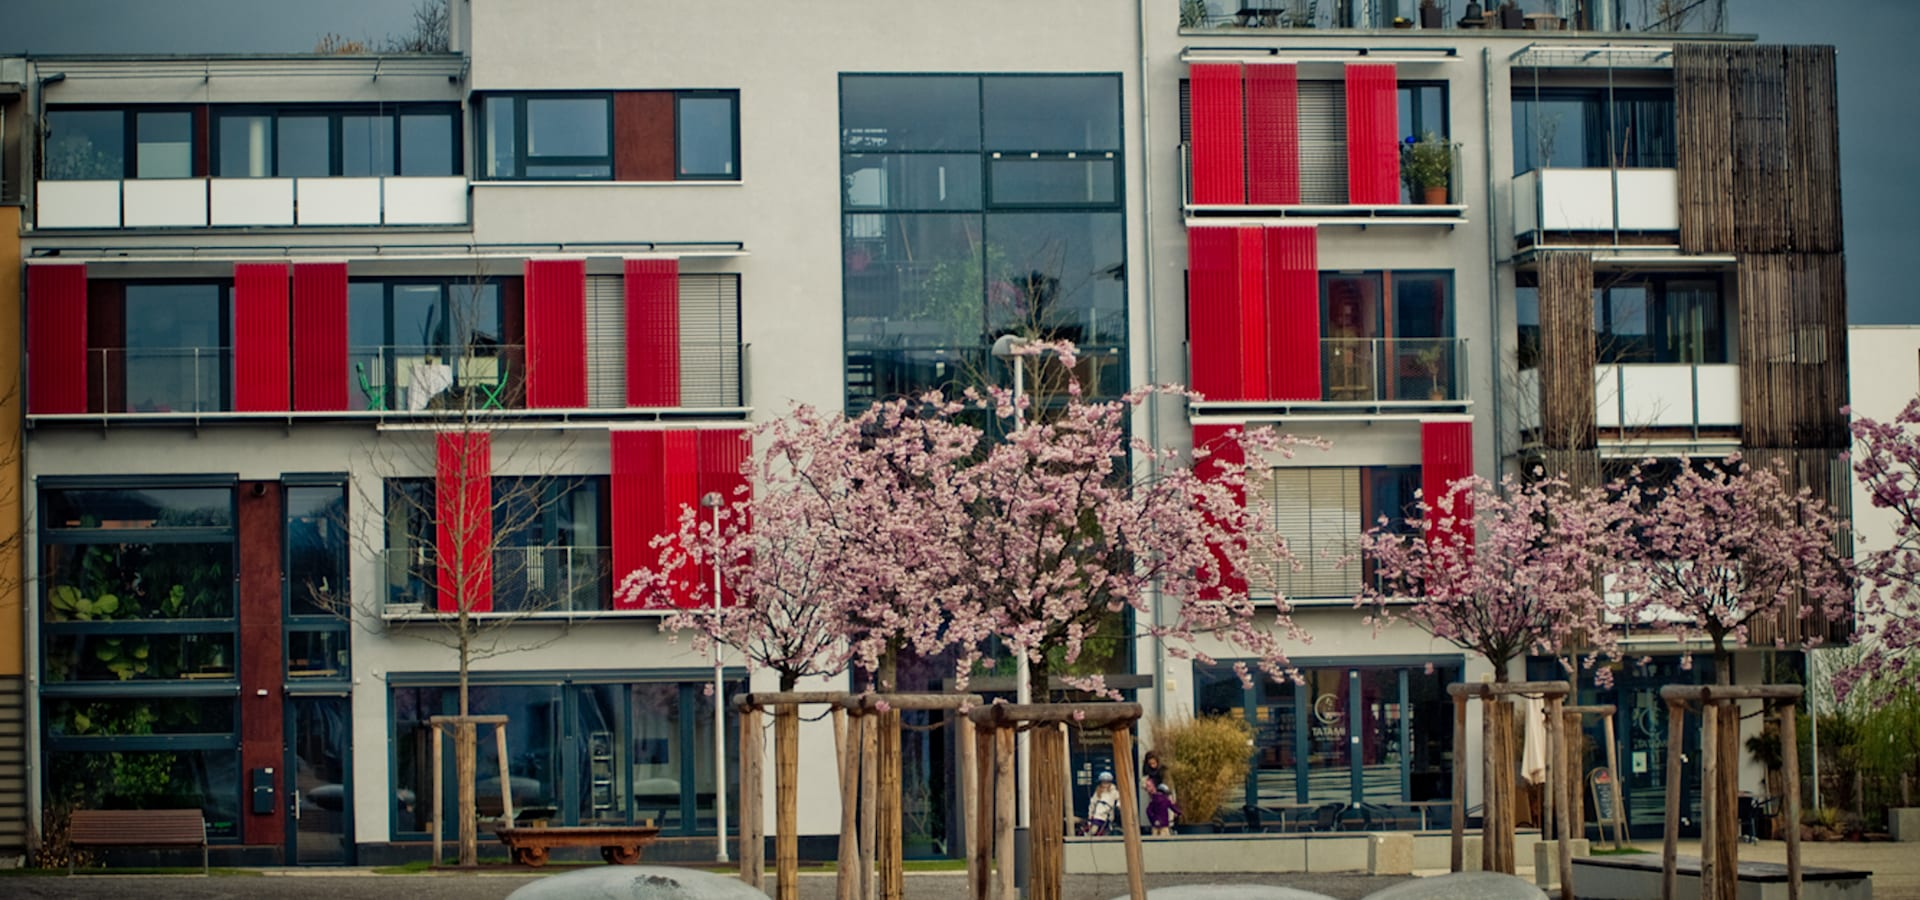 planugsgruppe agsn architekten GmbH